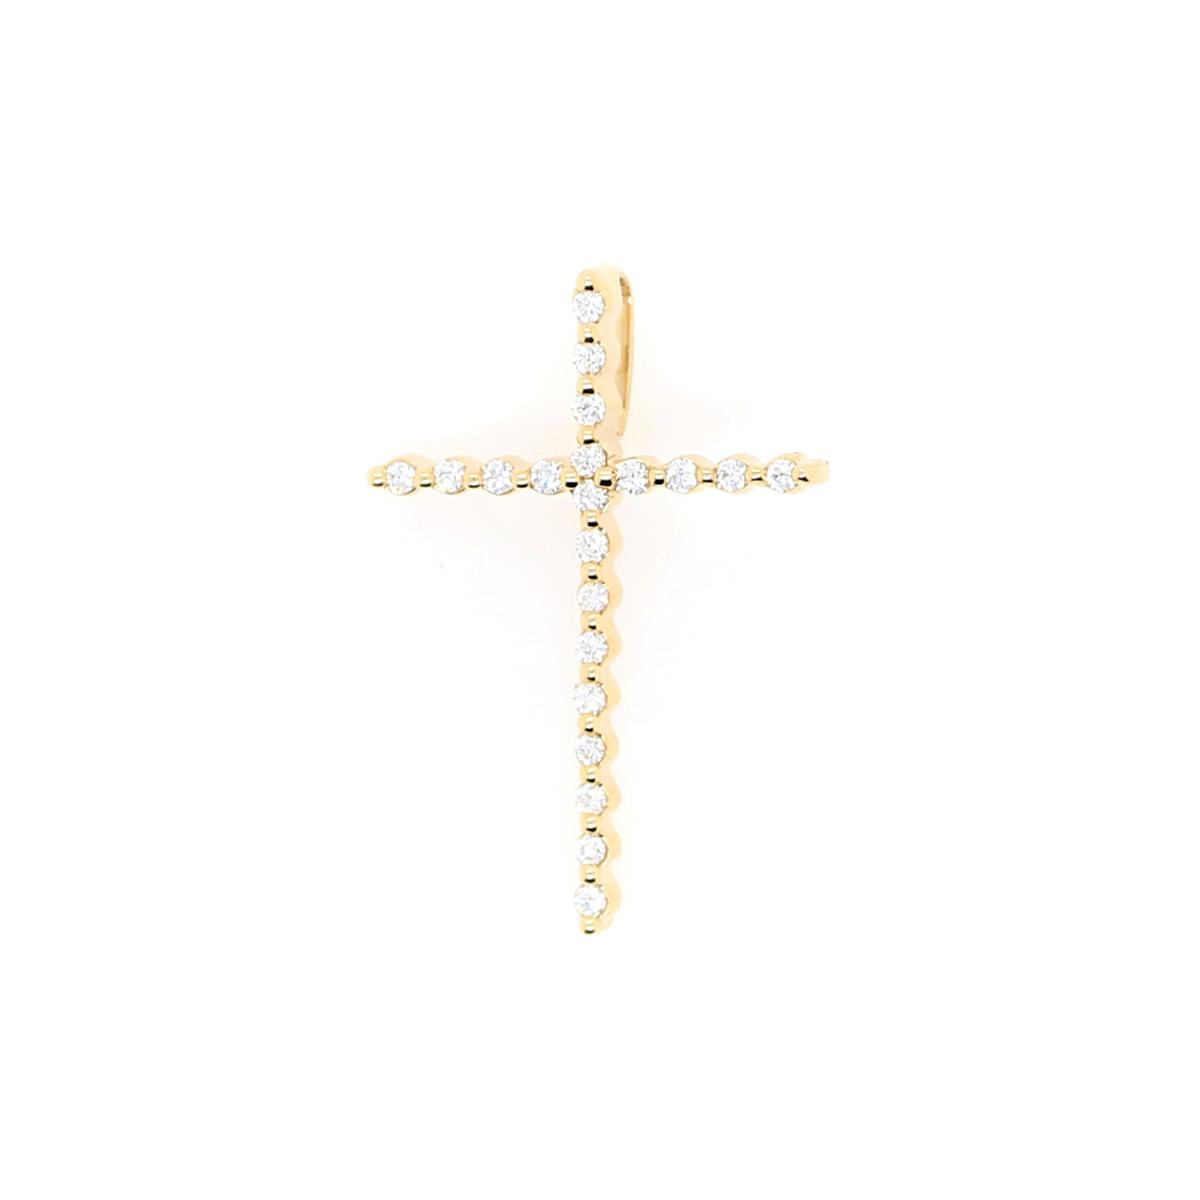 Shefi Diamonds 14 Karat Yellow Gold Diamond Cross Pendant